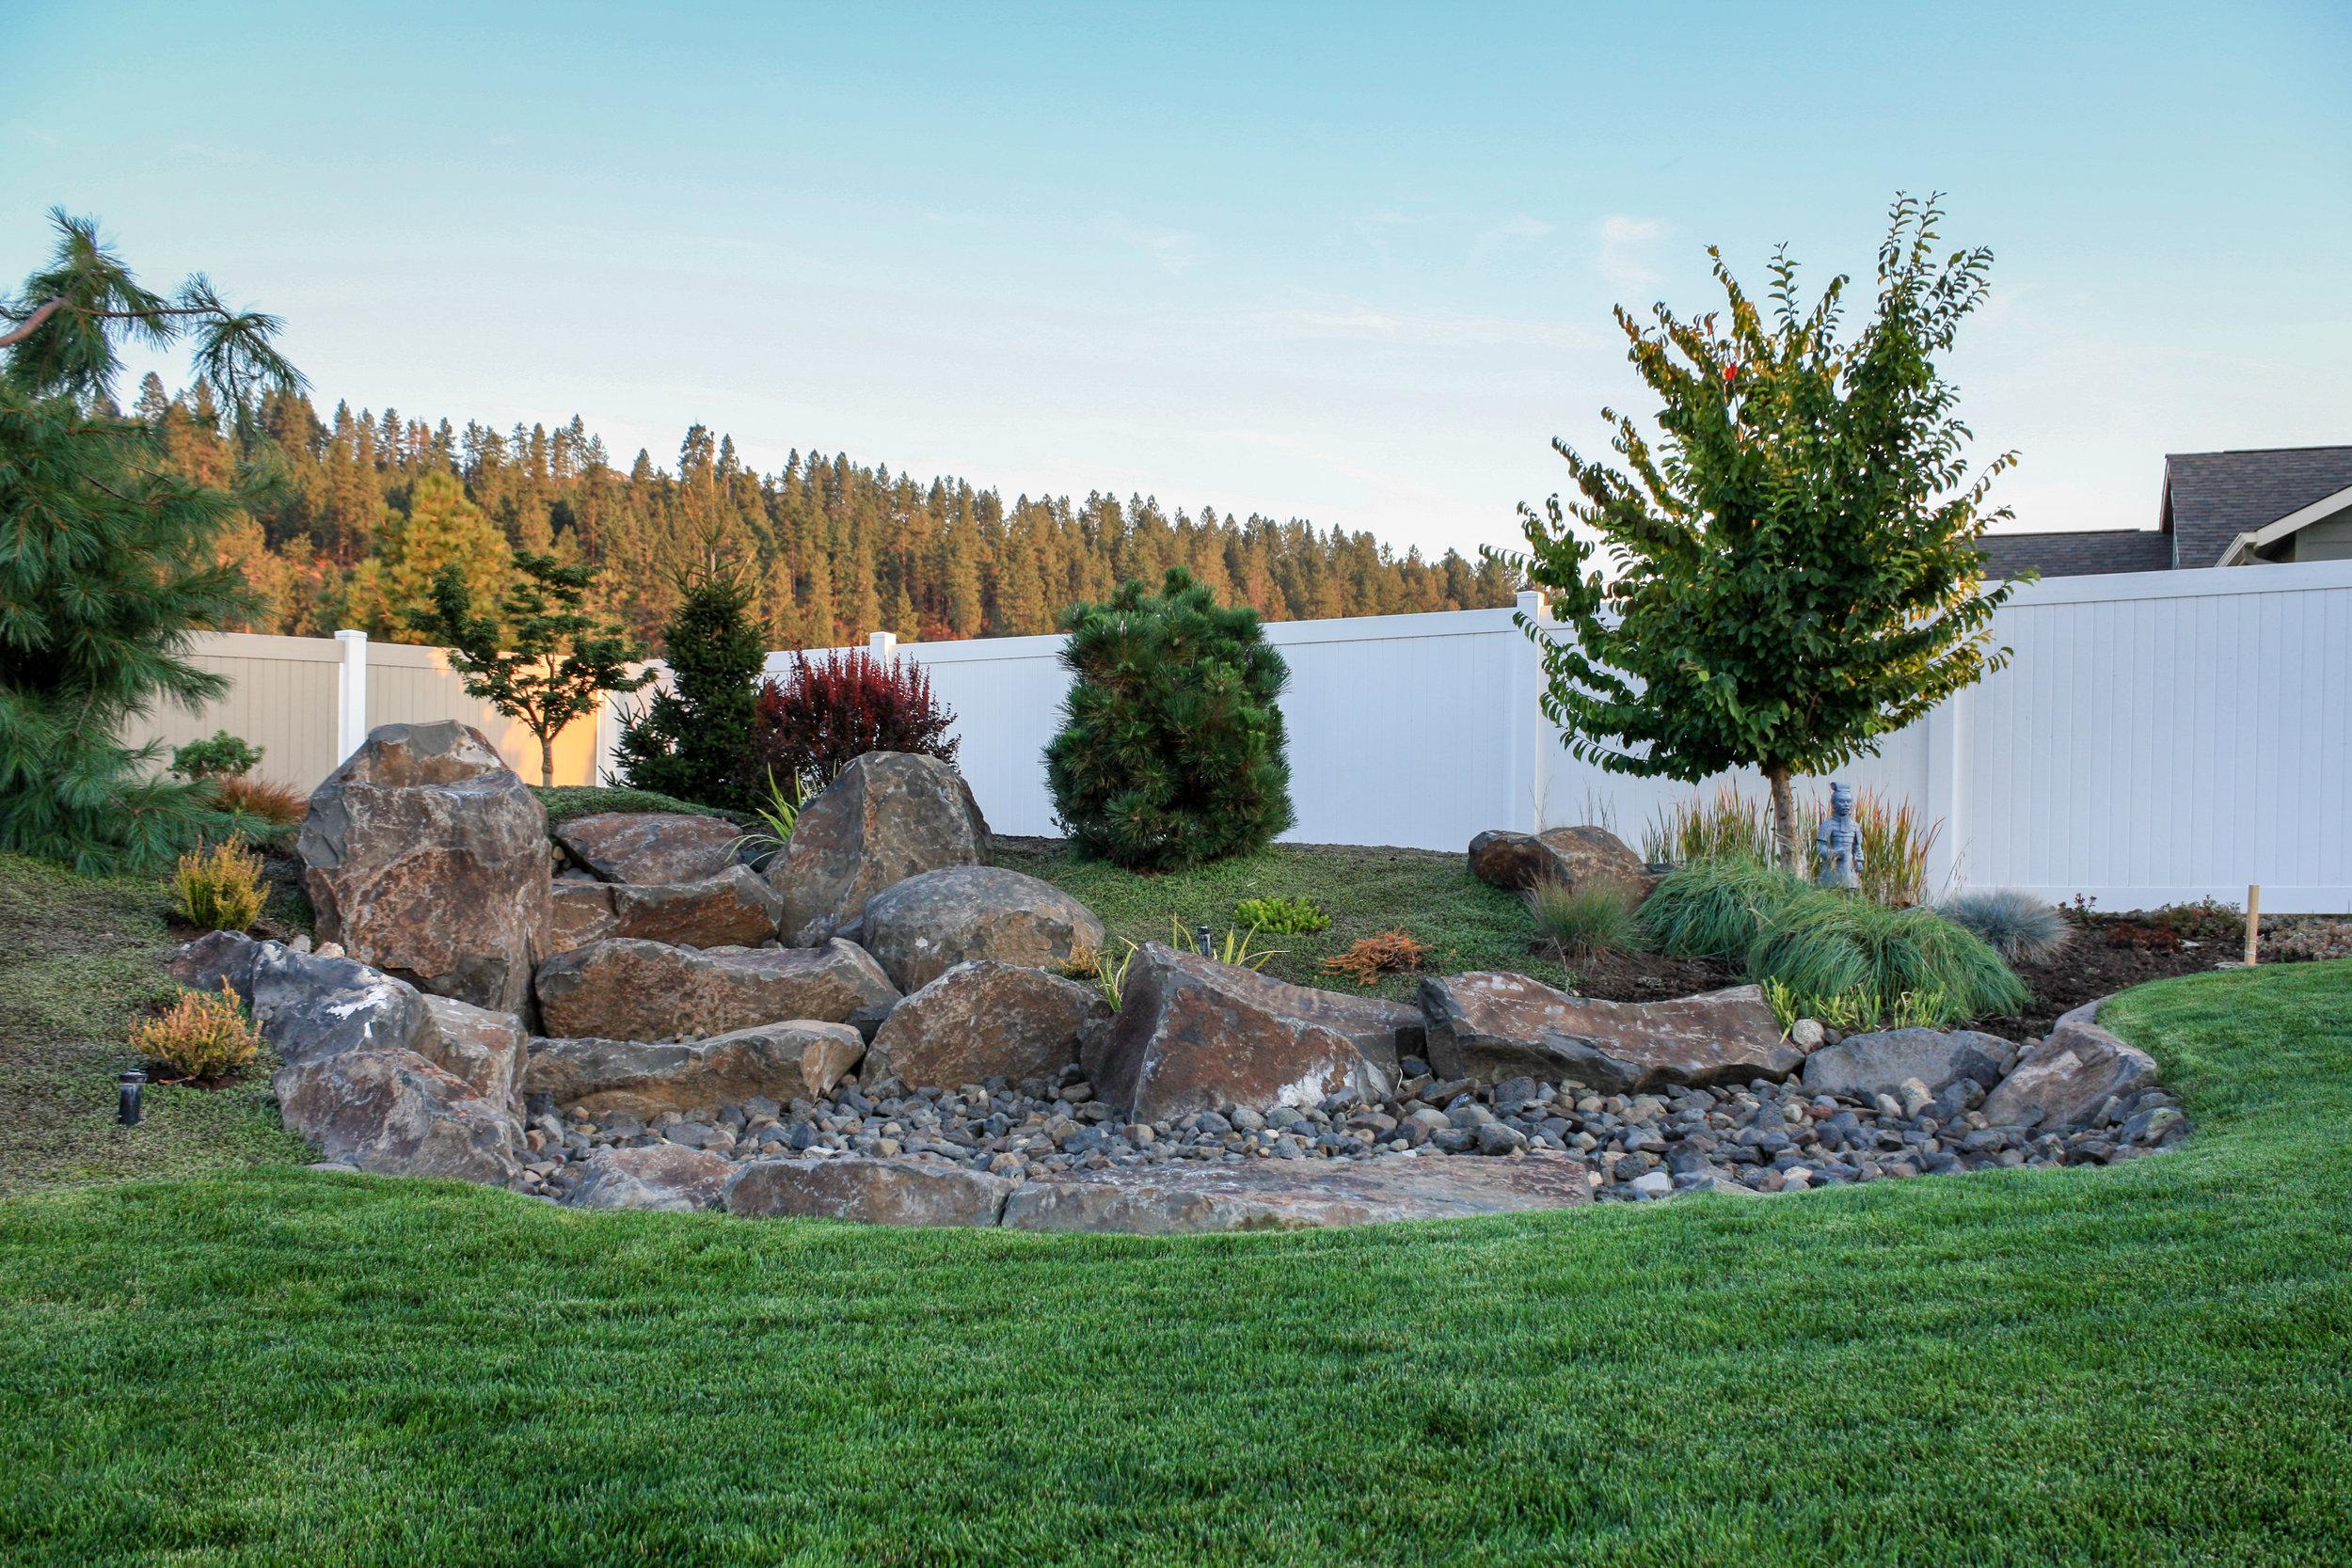 Shelley Lake Backyard Spokane Valley Landscape Design Pacific